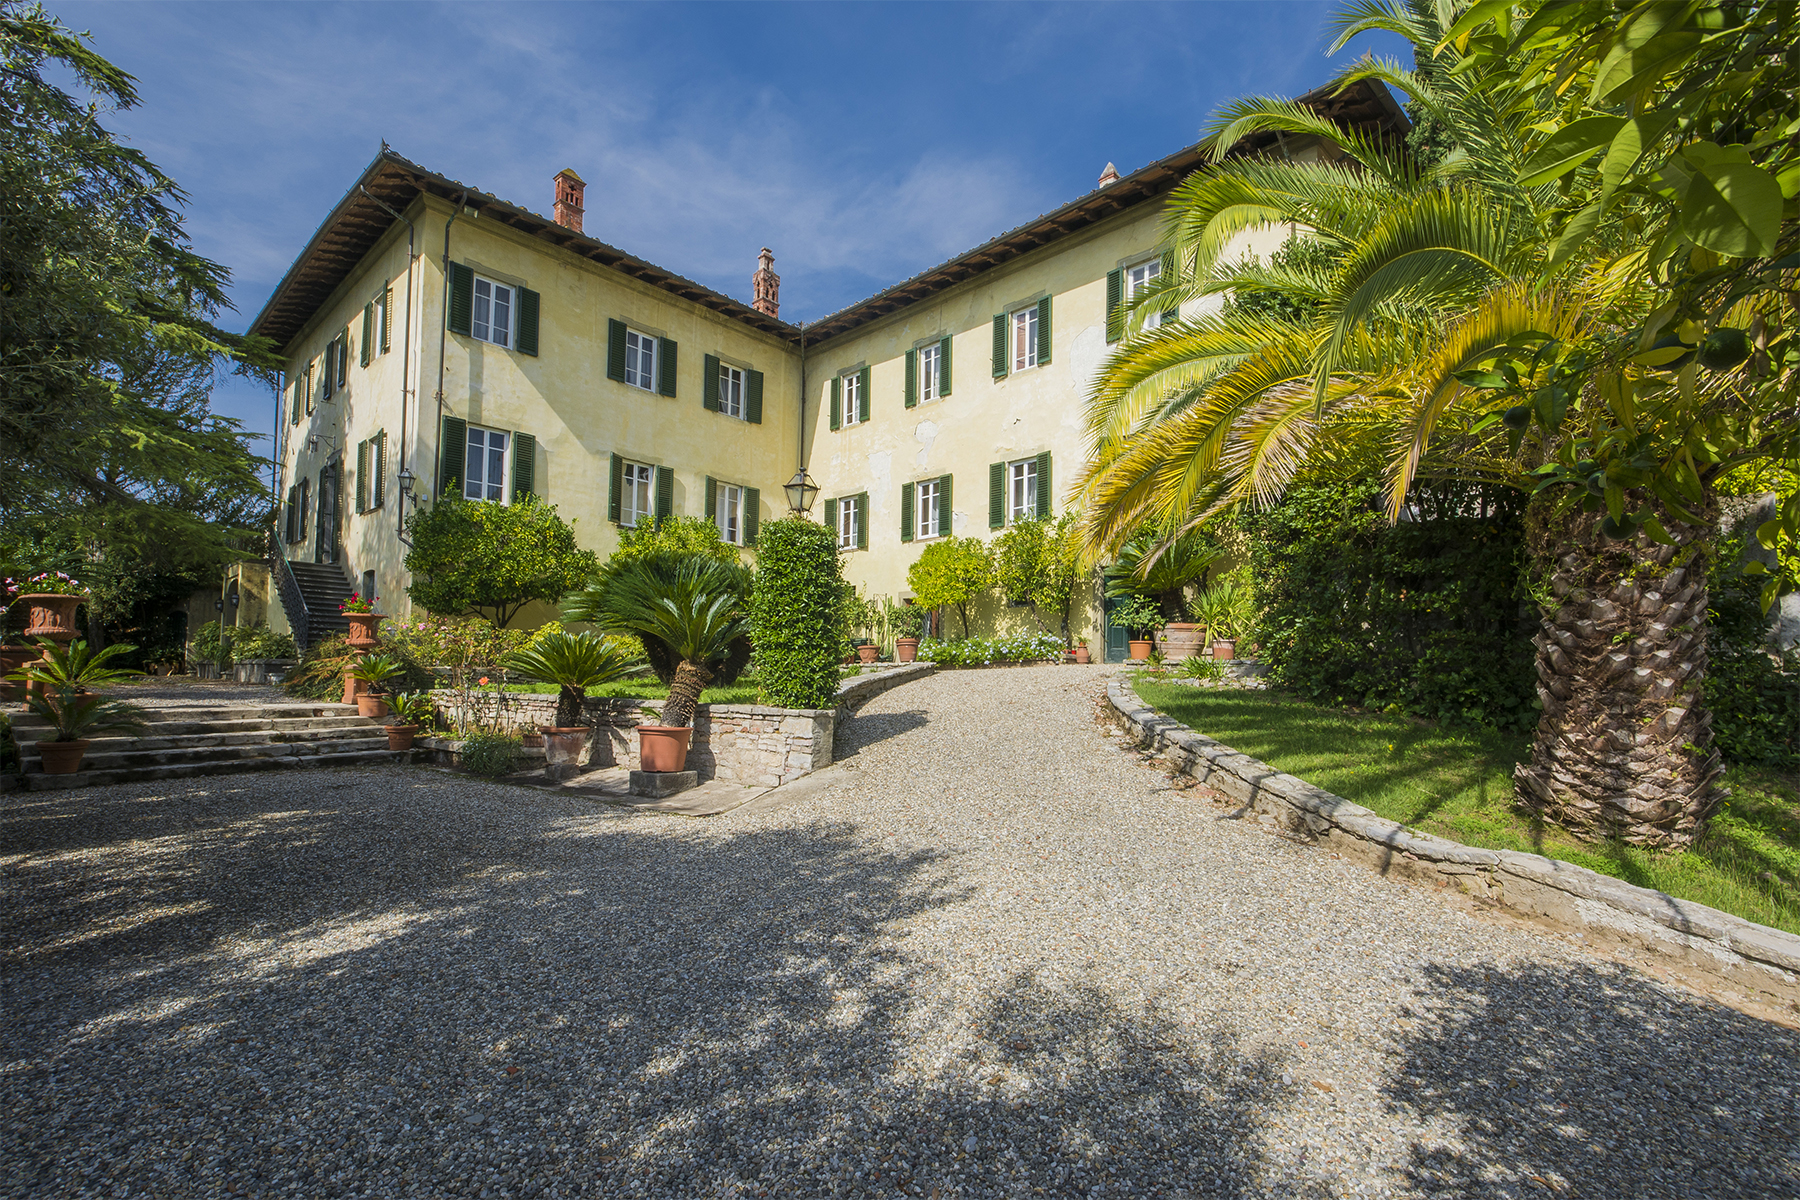 Villa in Vendita a Lucca: 5 locali, 1210 mq - Foto 1